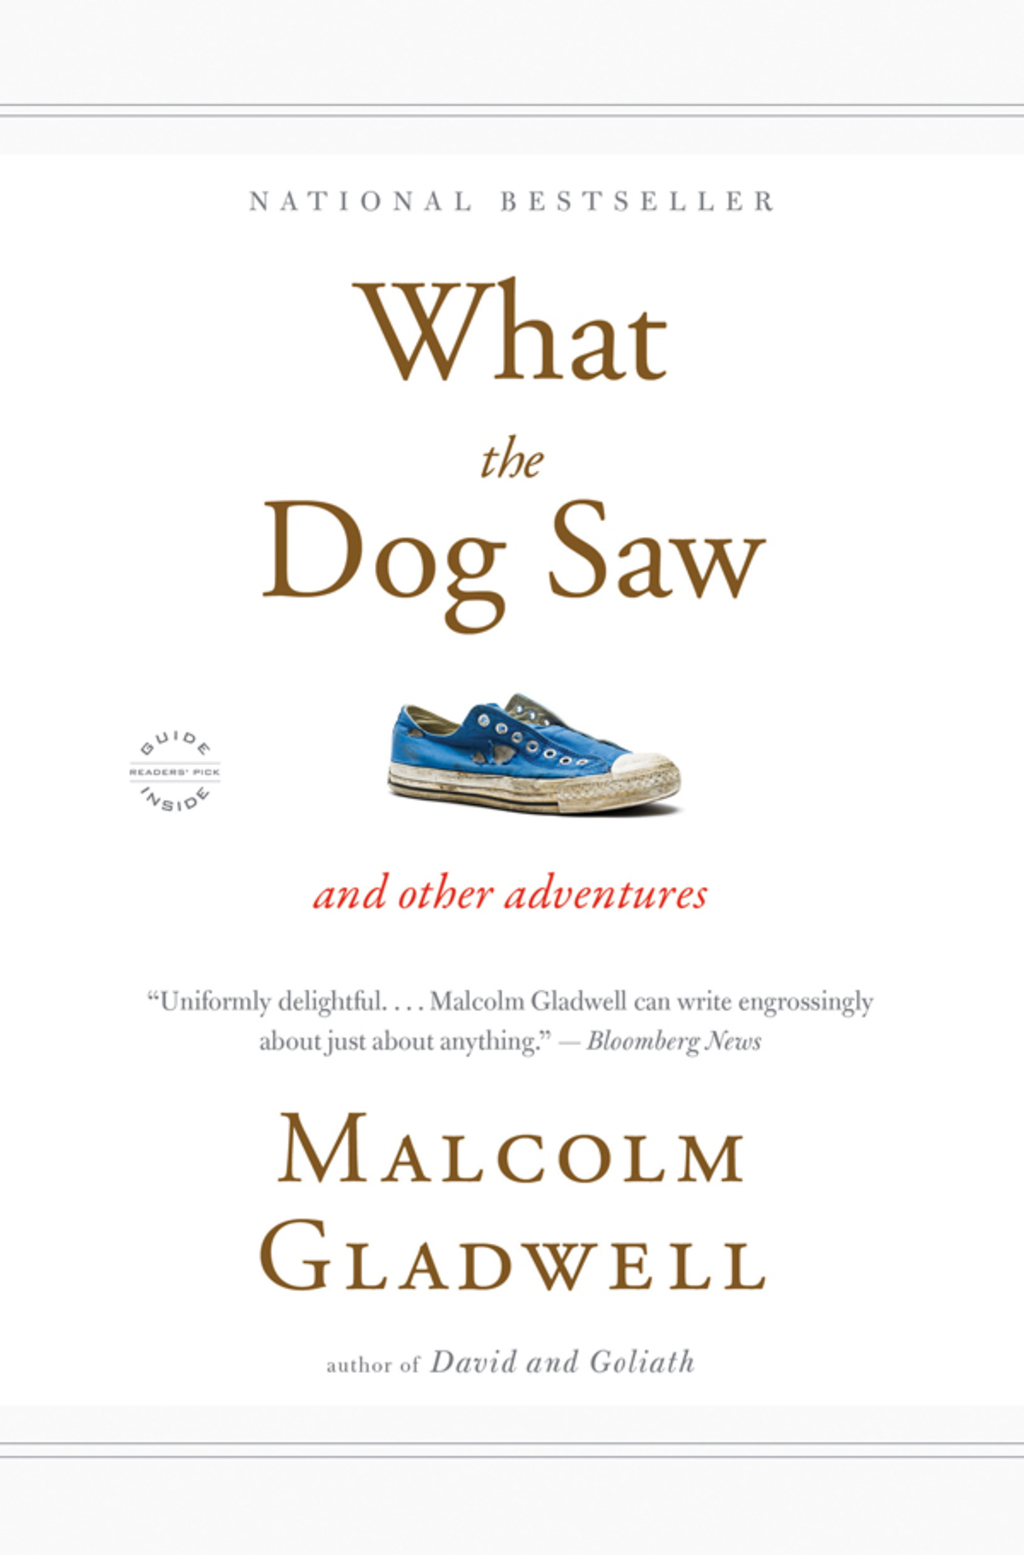 By Malcolm Gladwell PRINTISBN: 9780316086134 E-TEXT ISBN: 9780316086134 Edition: 0